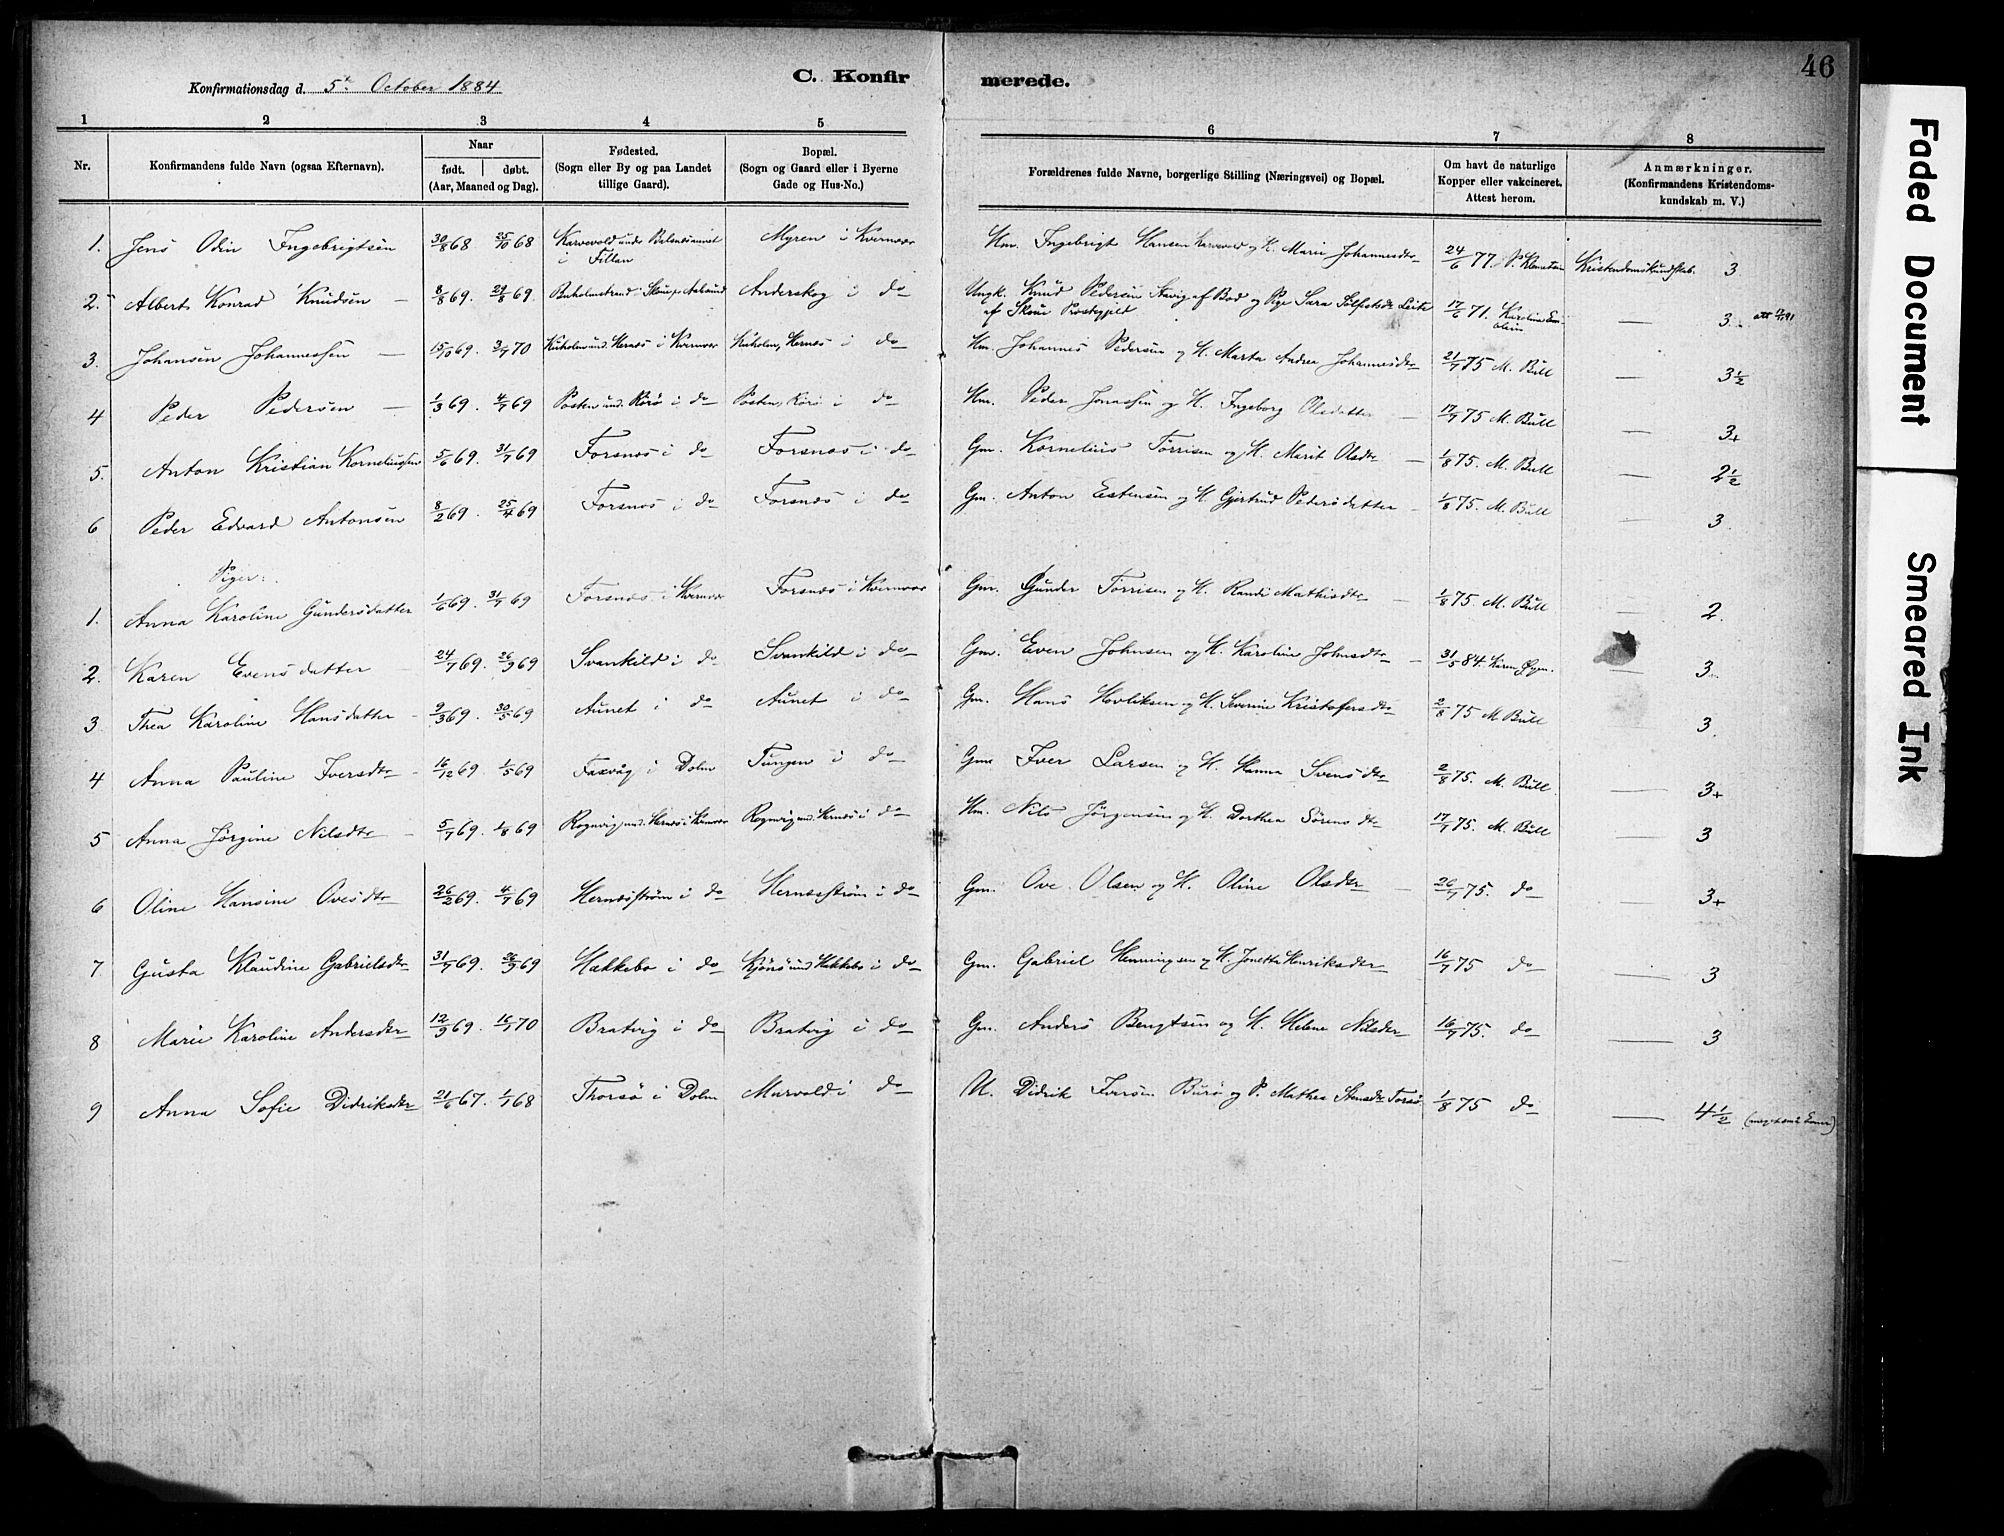 SAT, Ministerialprotokoller, klokkerbøker og fødselsregistre - Sør-Trøndelag, 635/L0551: Parish register (official) no. 635A01, 1882-1899, p. 46